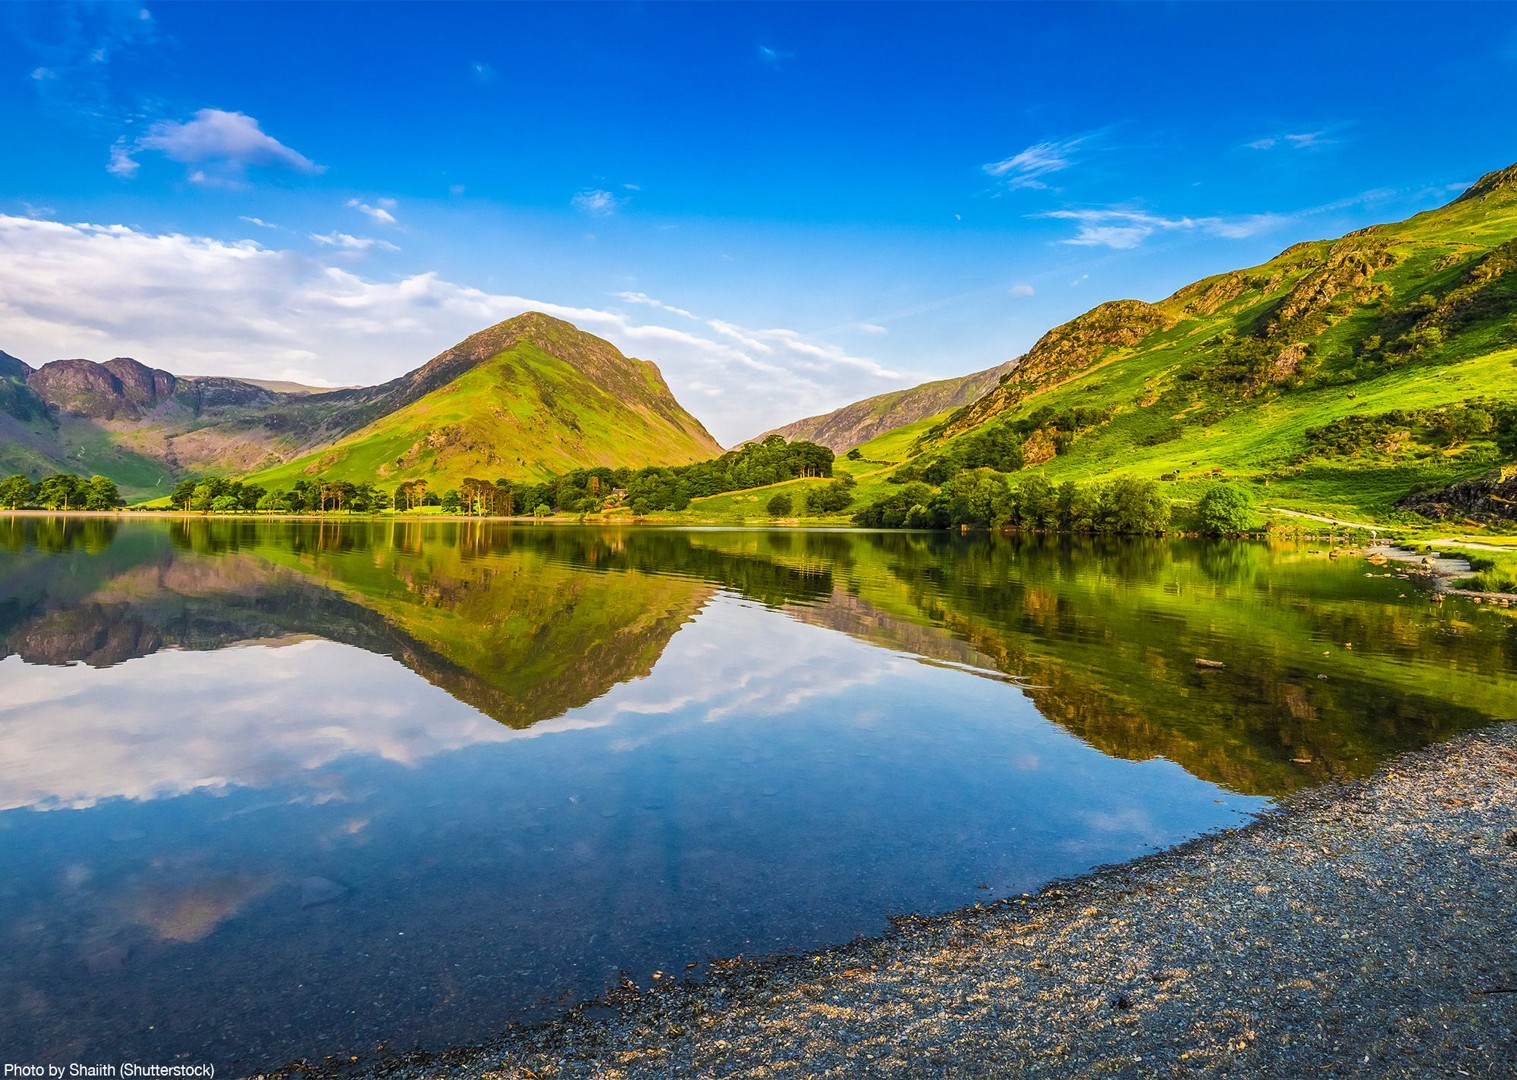 local-lakes-skiddaw-blencartha-mountains-biking-tour-skedaddle.jpg - UK - North Lake District Explorer - Guided Road Cycling Weekend - Road Cycling